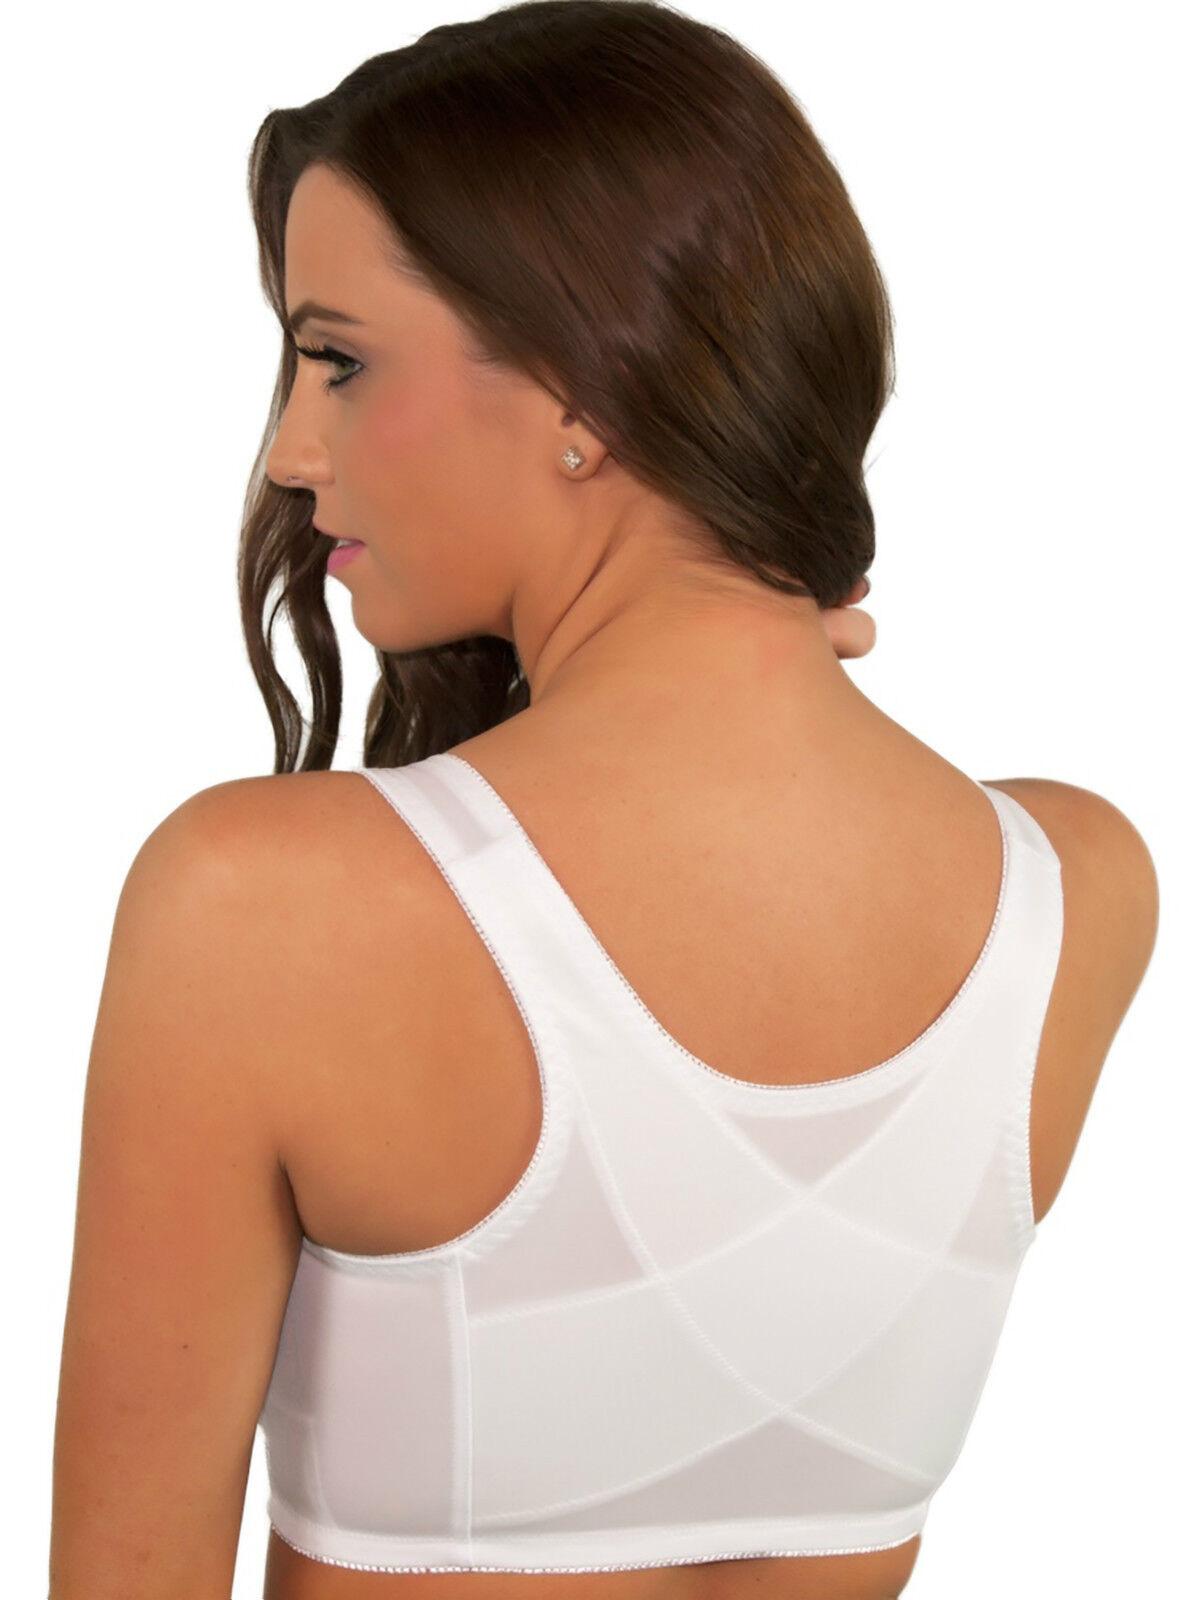 25ddb0b89 Αγορά Γυναικεία ρούχα Front Closure Bra Back Support Posture White Lace 36  38 40 42 44 46 B C D 96226 (1193x1600) ...